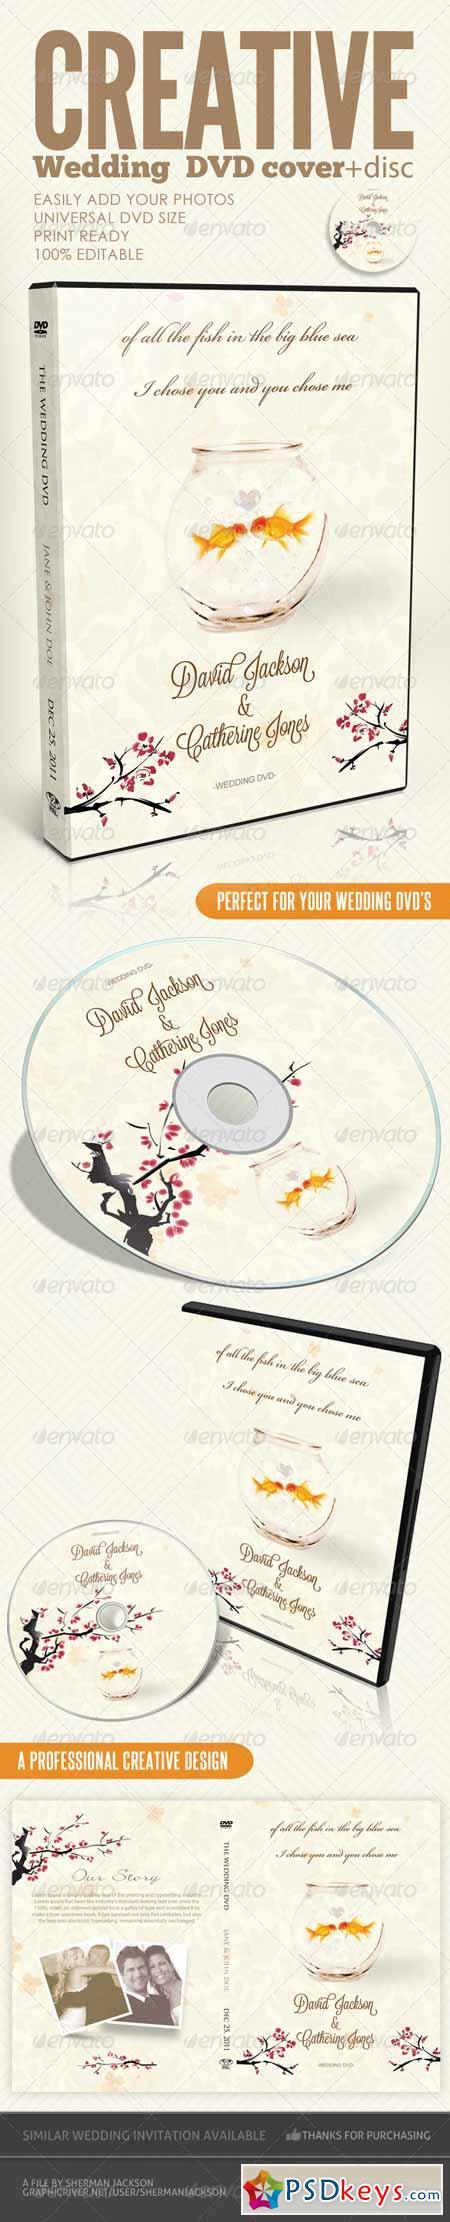 Creative Wedding DVD & Disc Label Artwork PSD 3218991